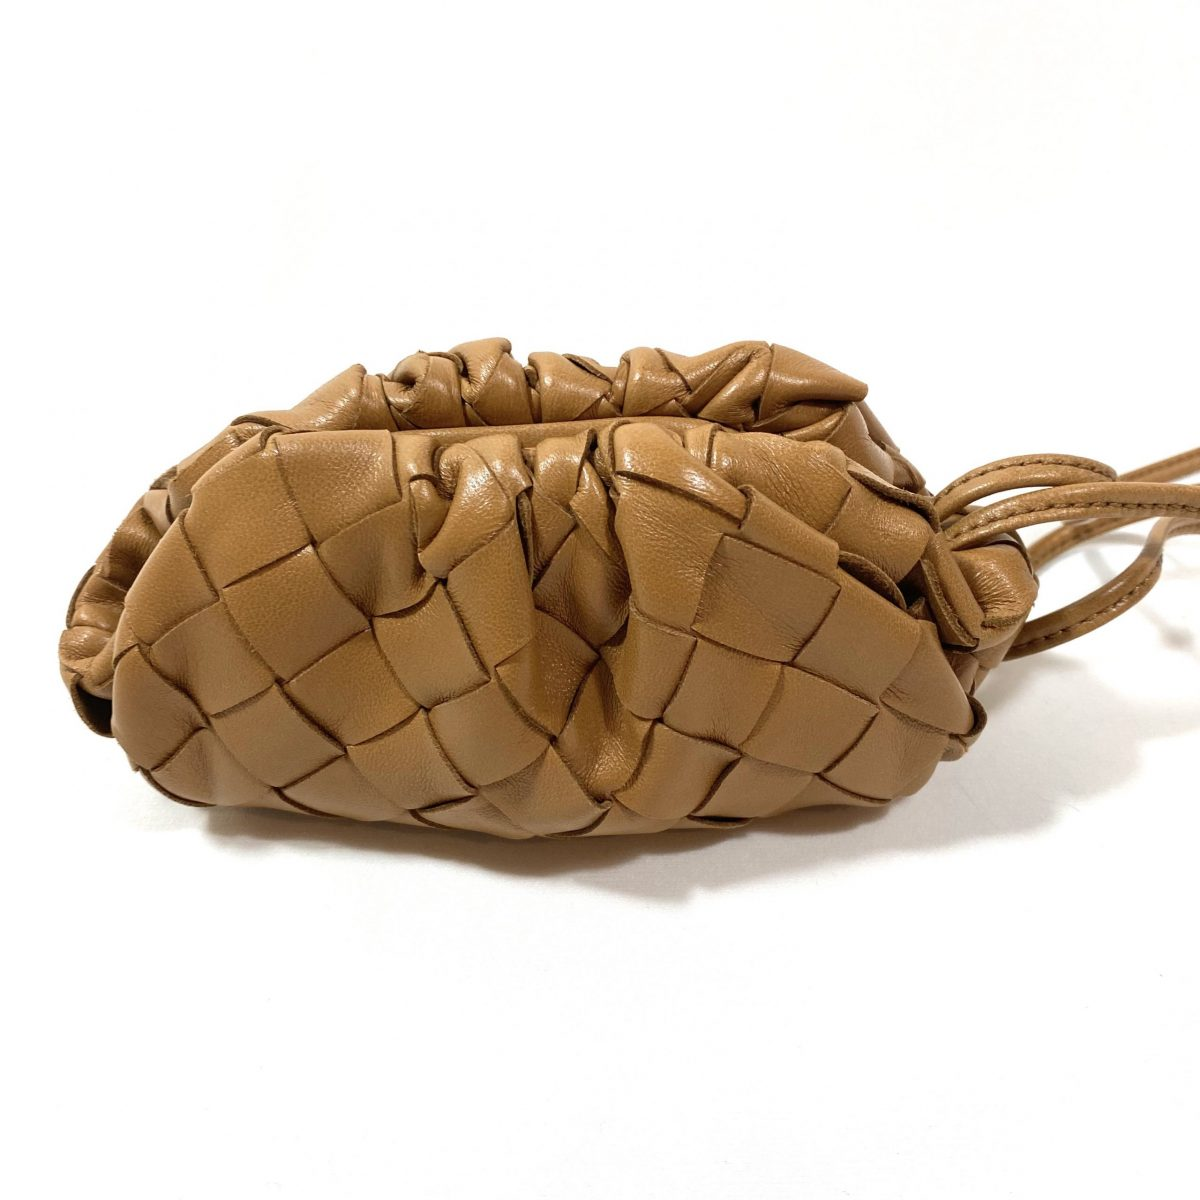 Bottega Veneta designer bags